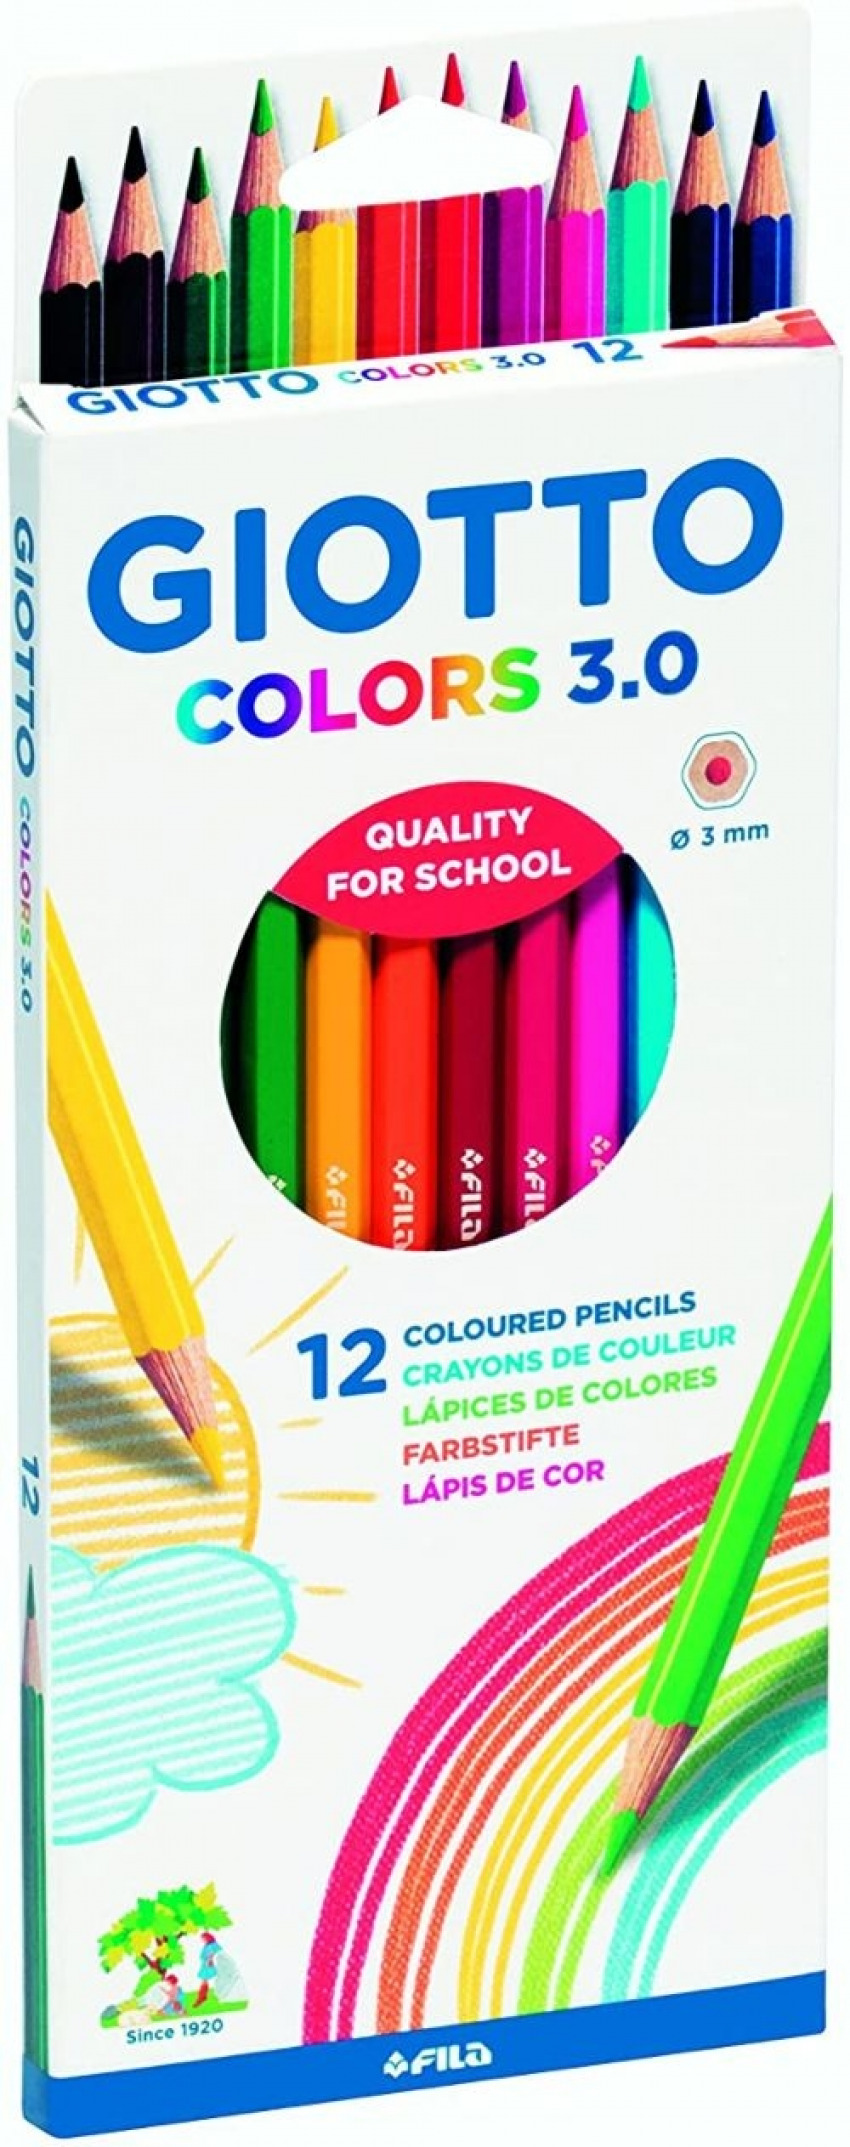 Estuche 12 lápices colores giotto colors 3.0 8000825009907